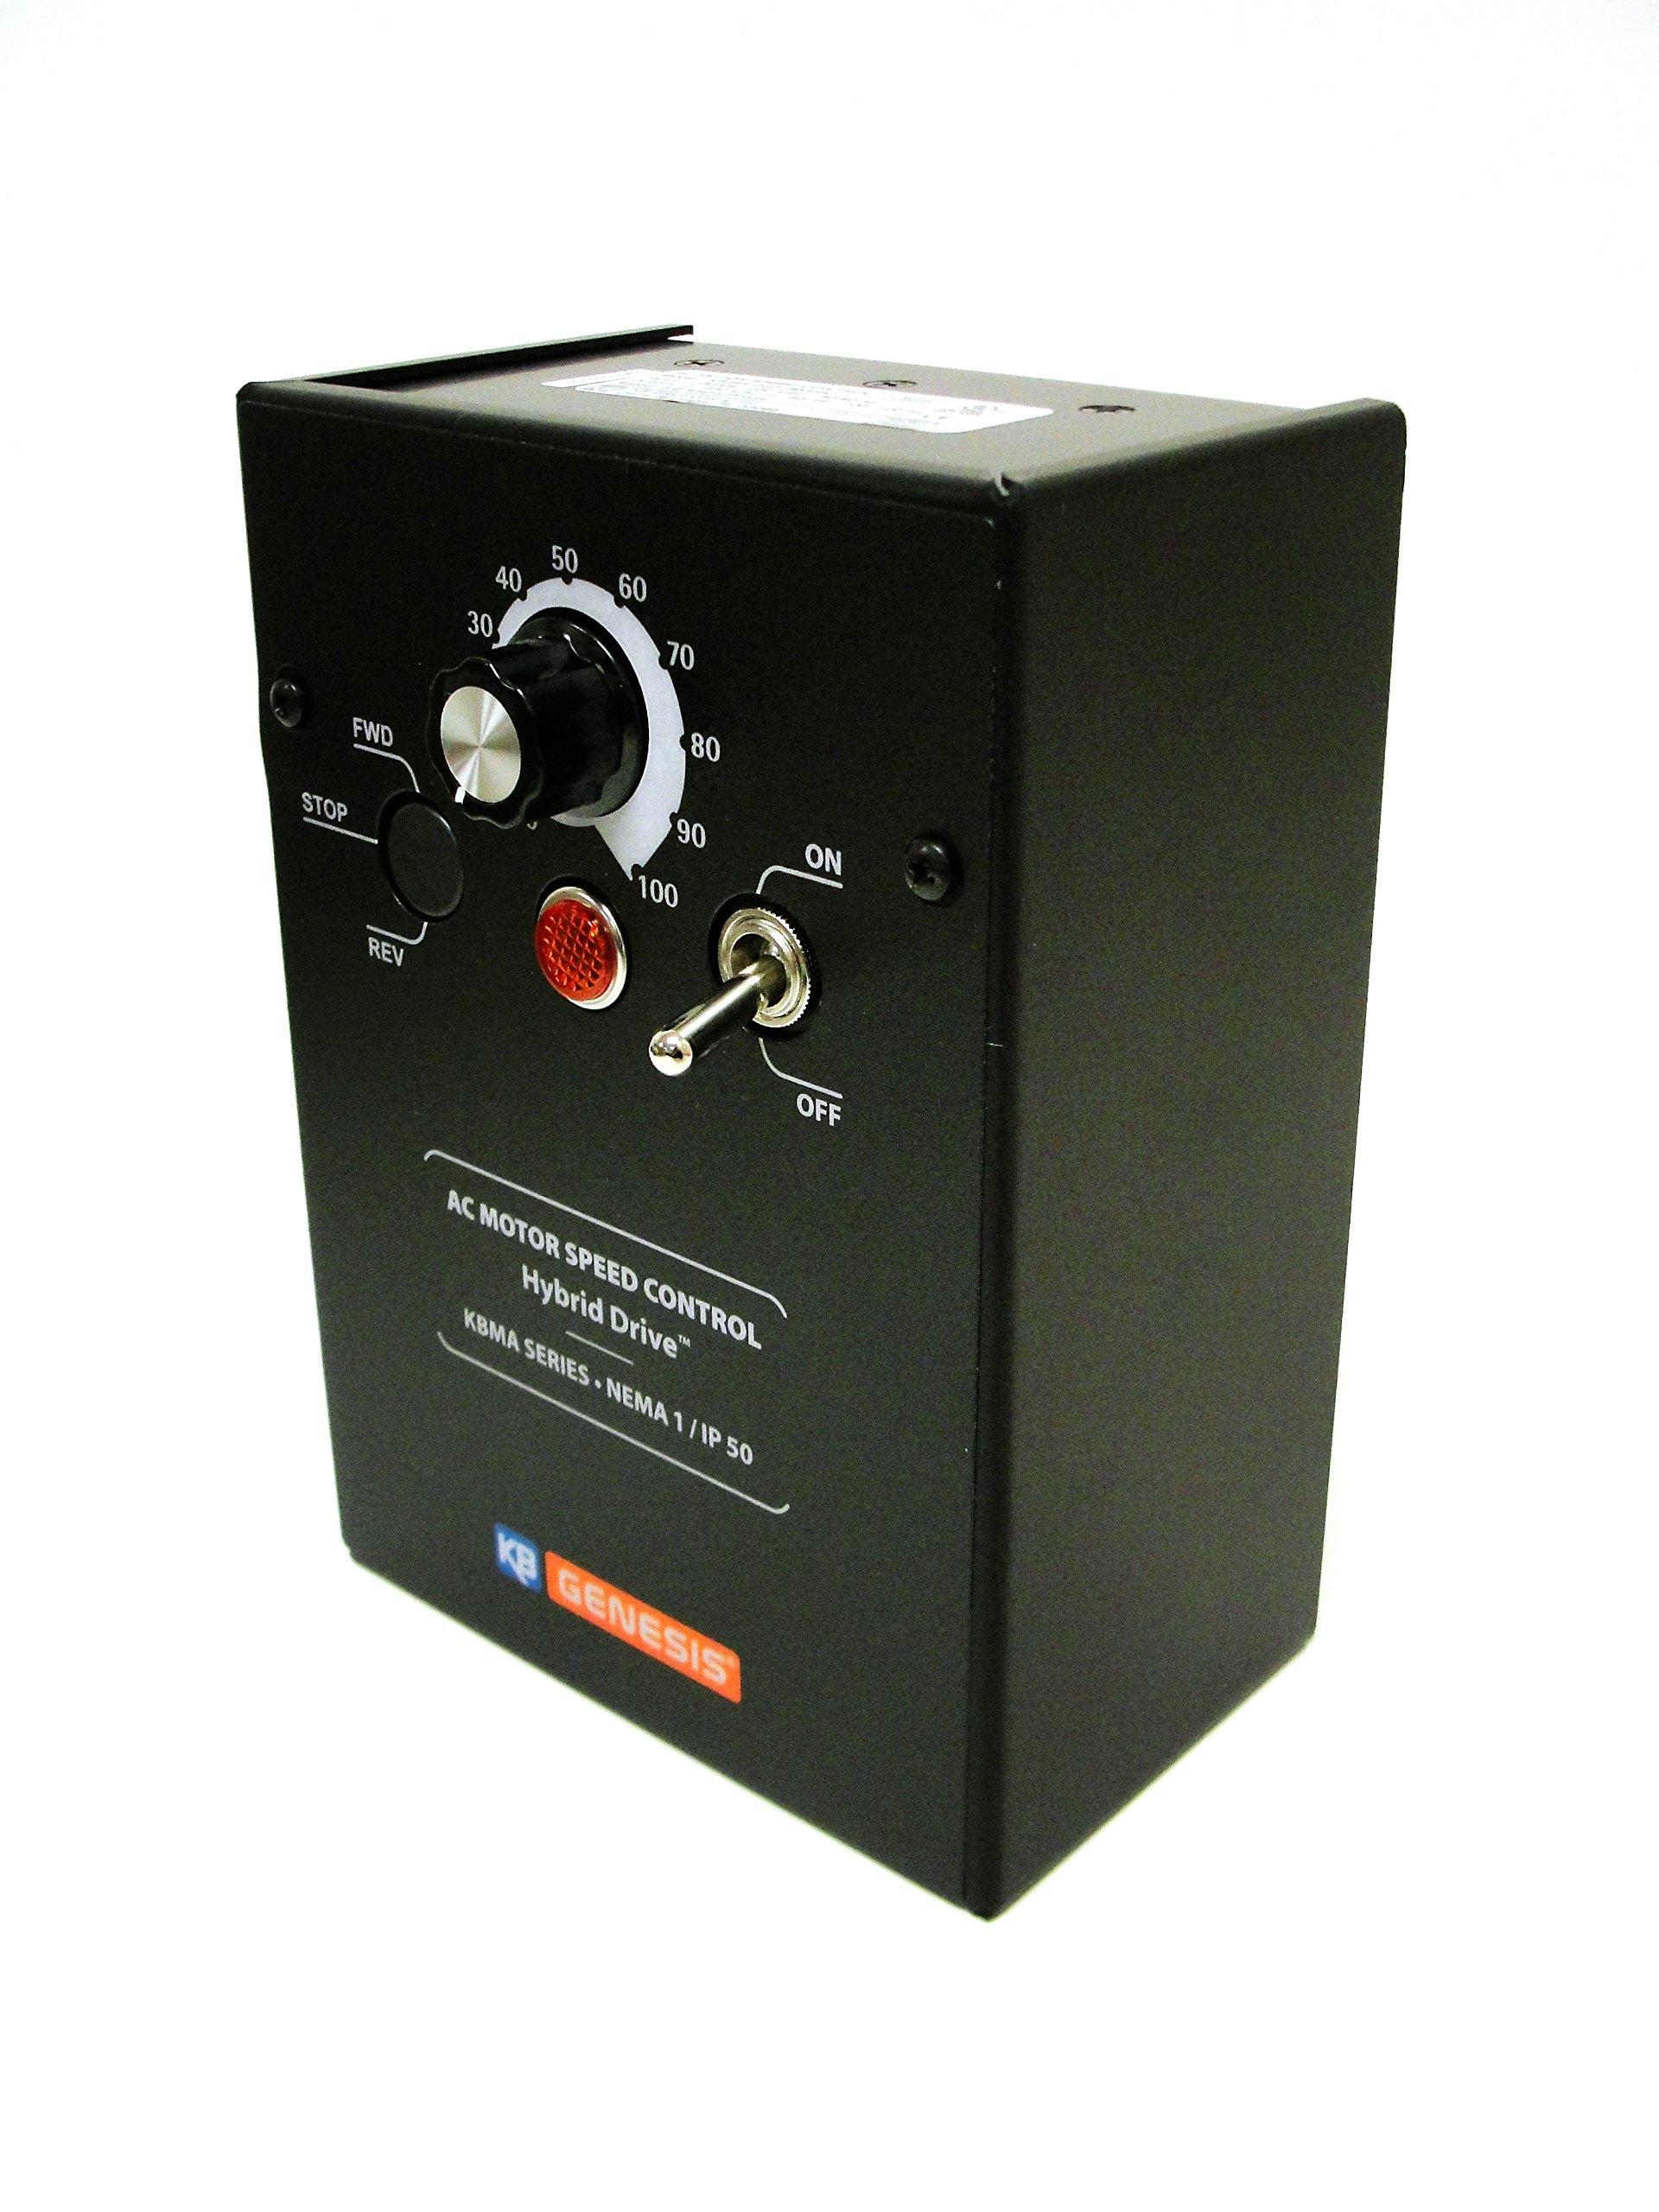 KBMA-24D by KB Electronics